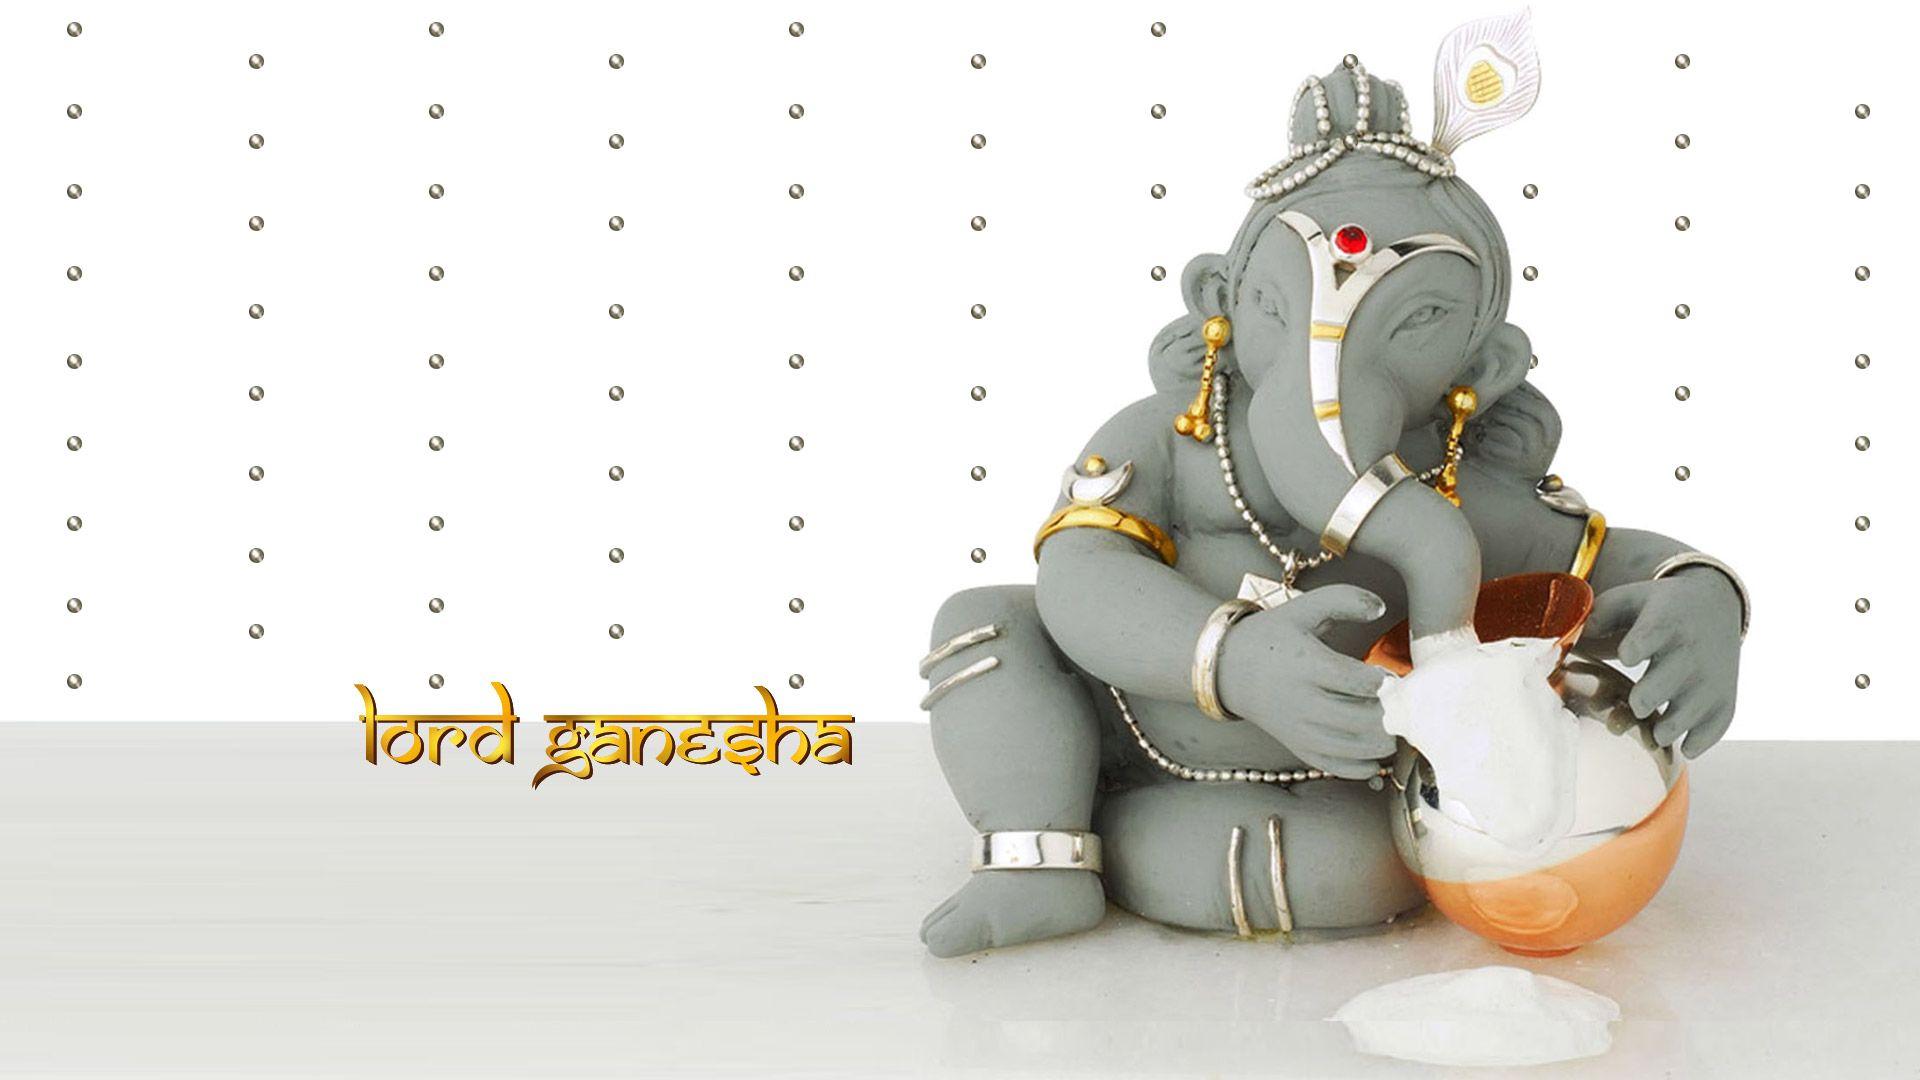 Lord Ganesha 1080p